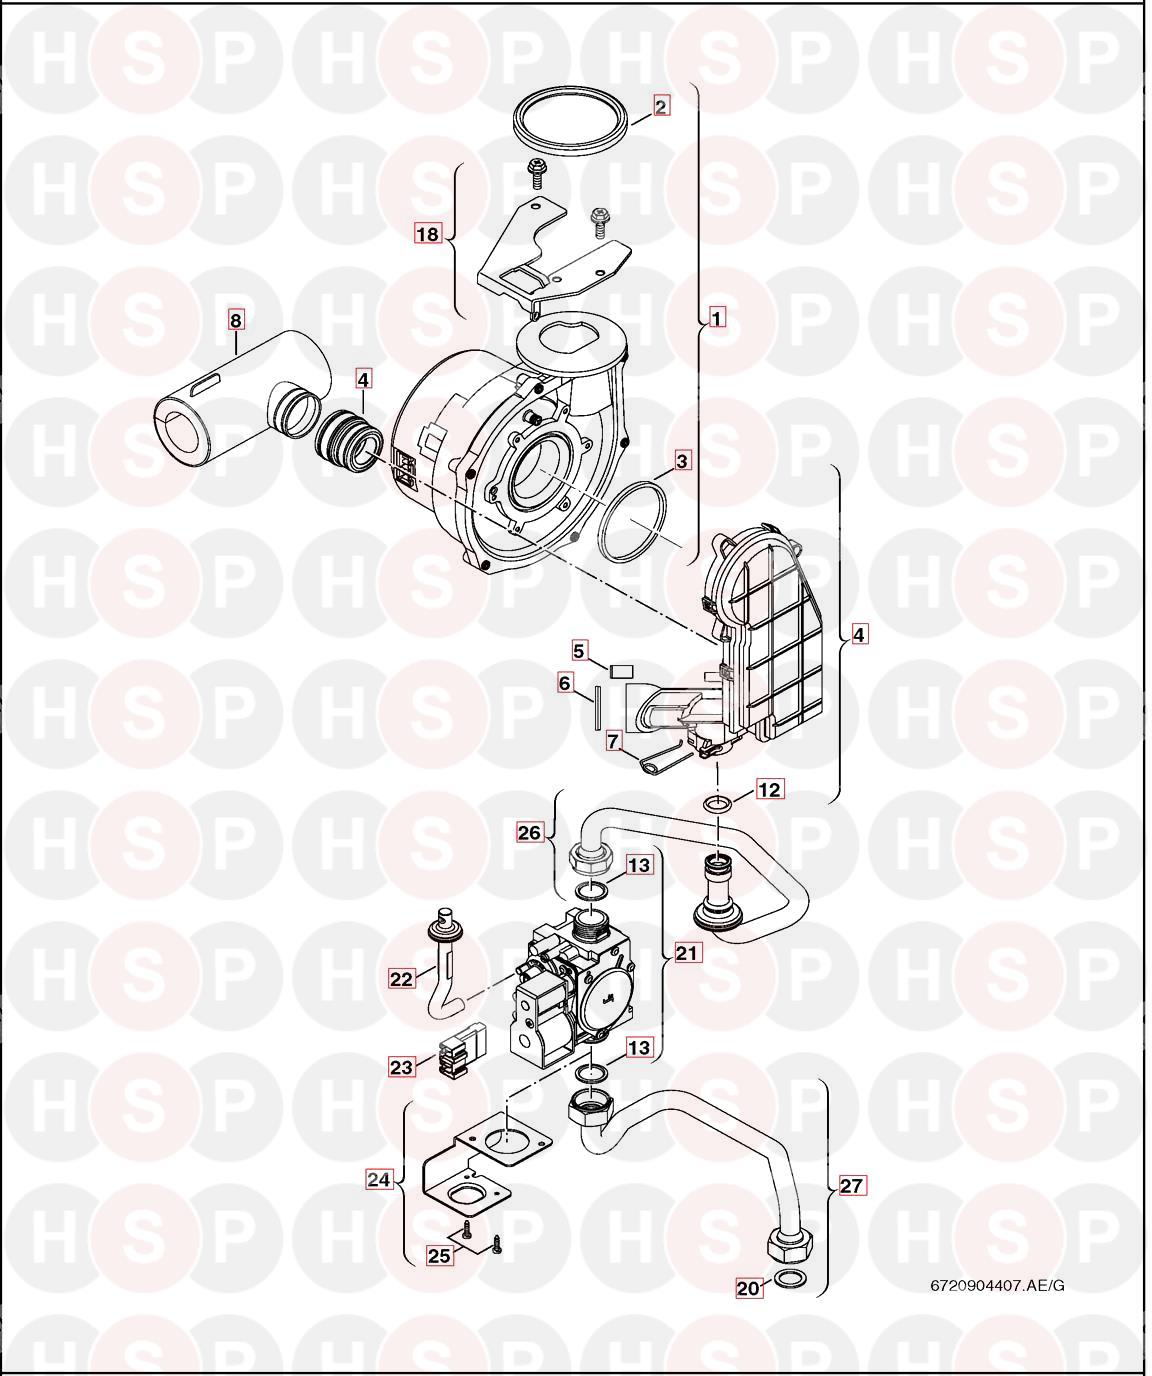 Worcester GREENSTAR 29CDI CLASSIC (FAN /GAS VALVE) Diagram